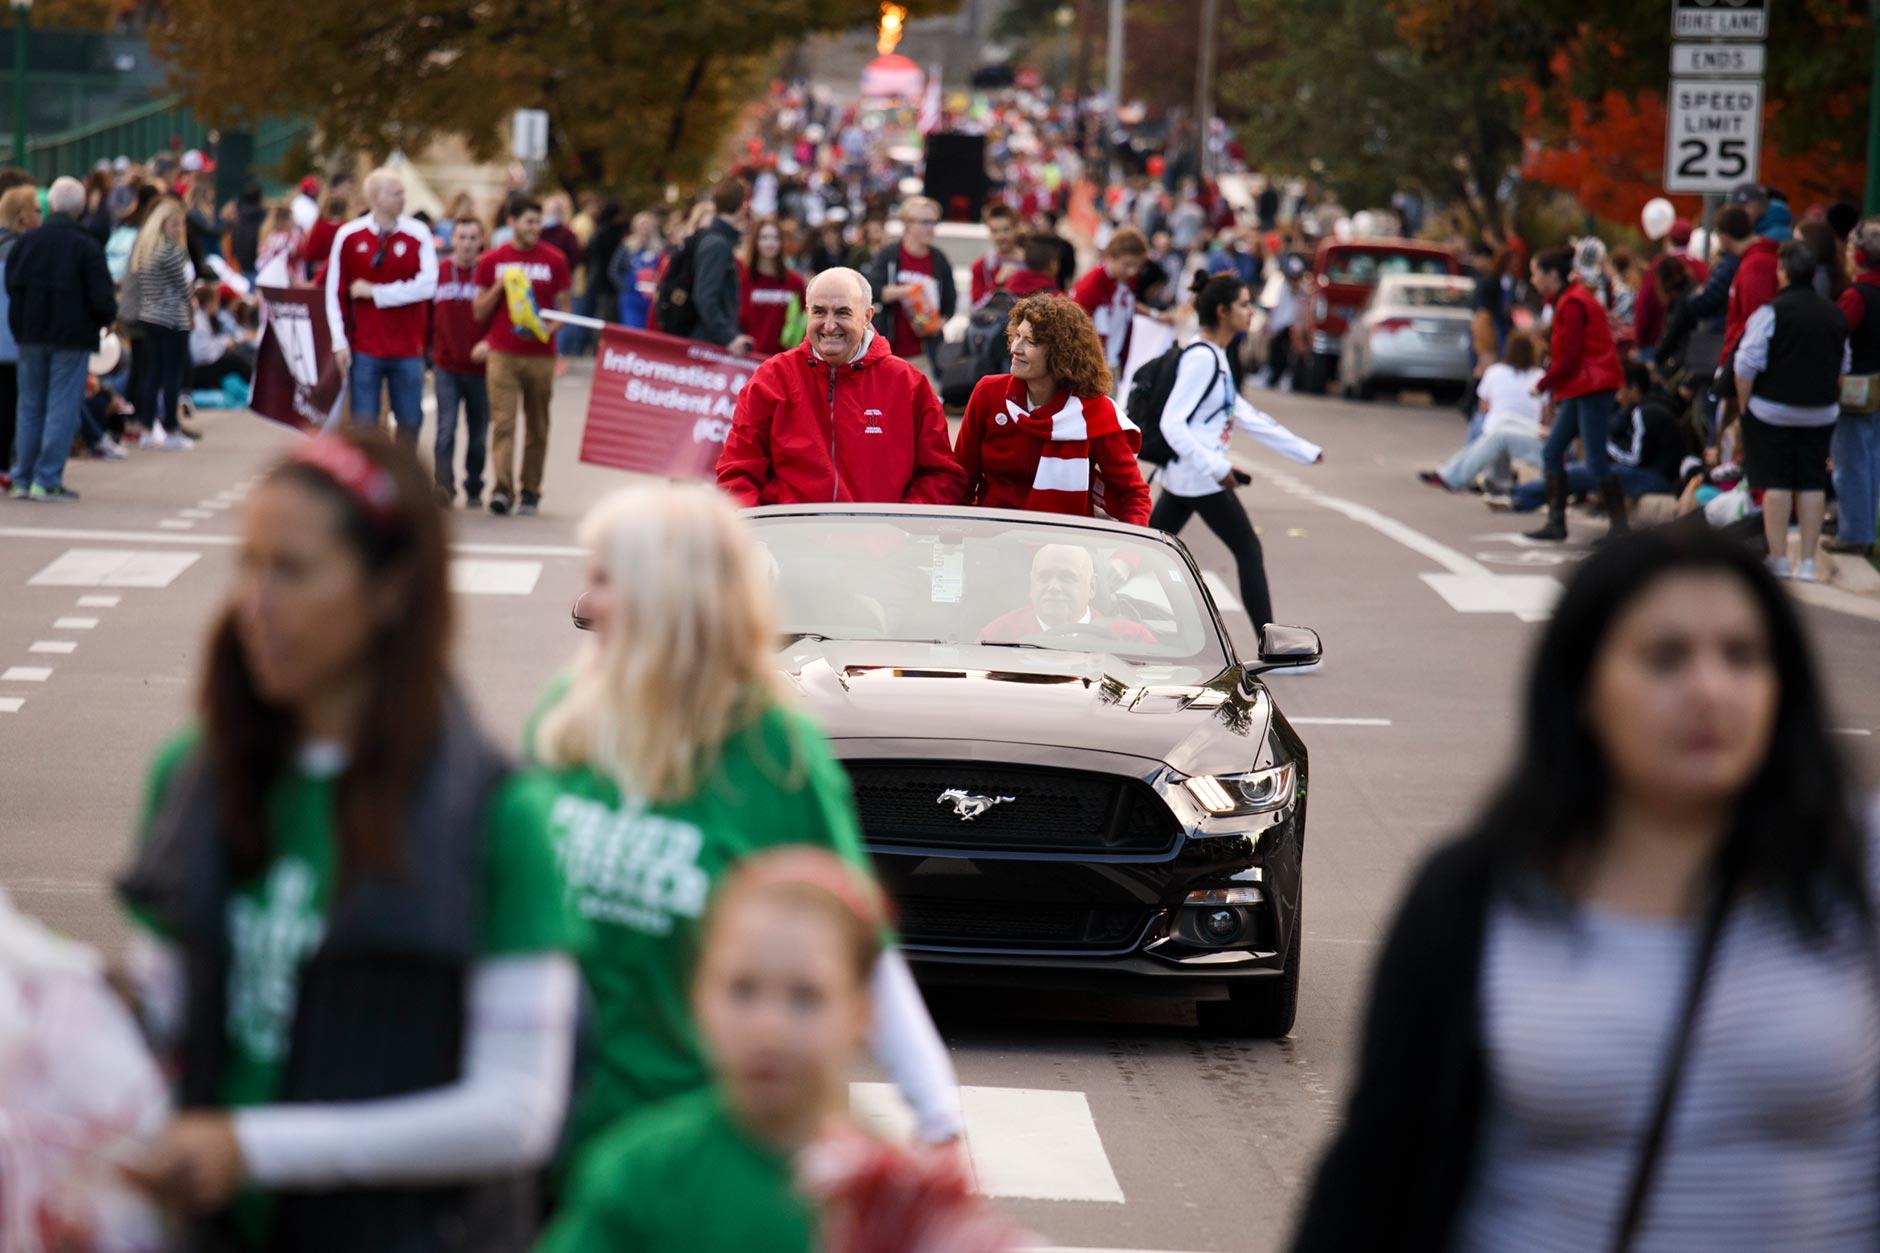 Indiana University Bloomington Homecoming Parade